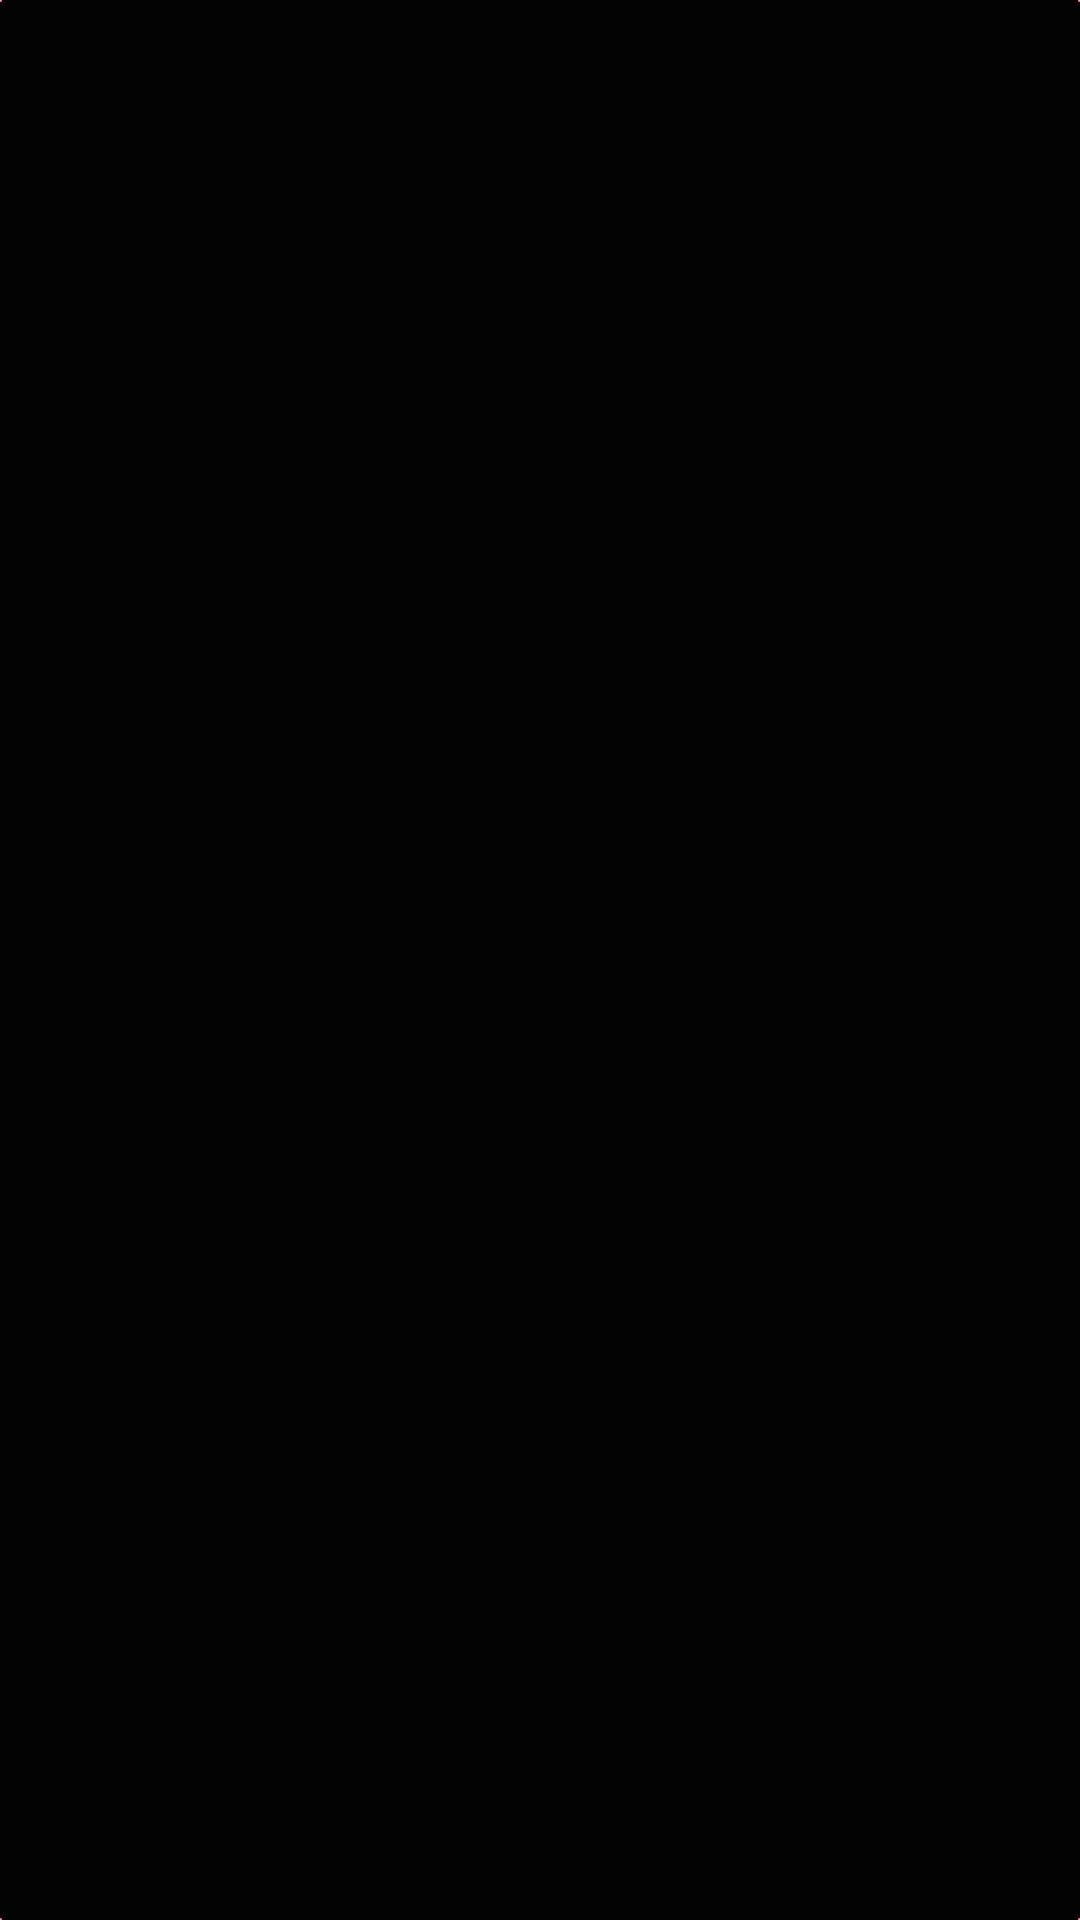 1287048 black wallpaper hd mobile 1080x1920 phone